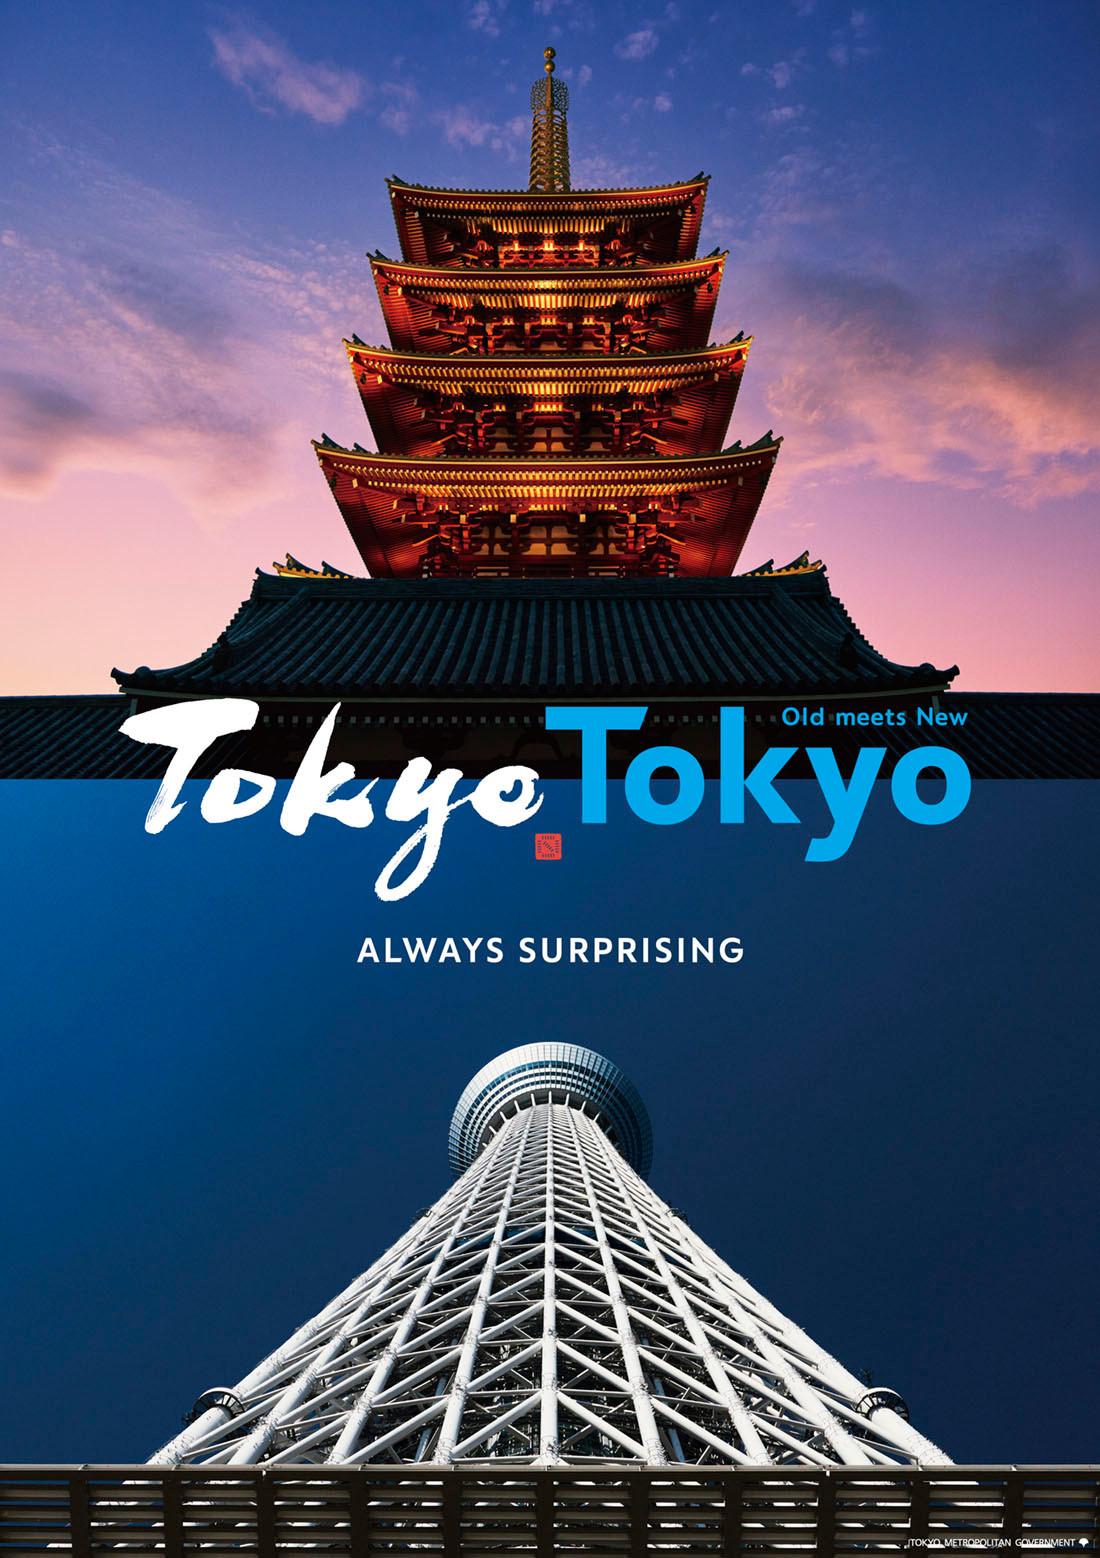 TokyoTokyo_seihen_A1_0207_nyuko_ol-01.jp